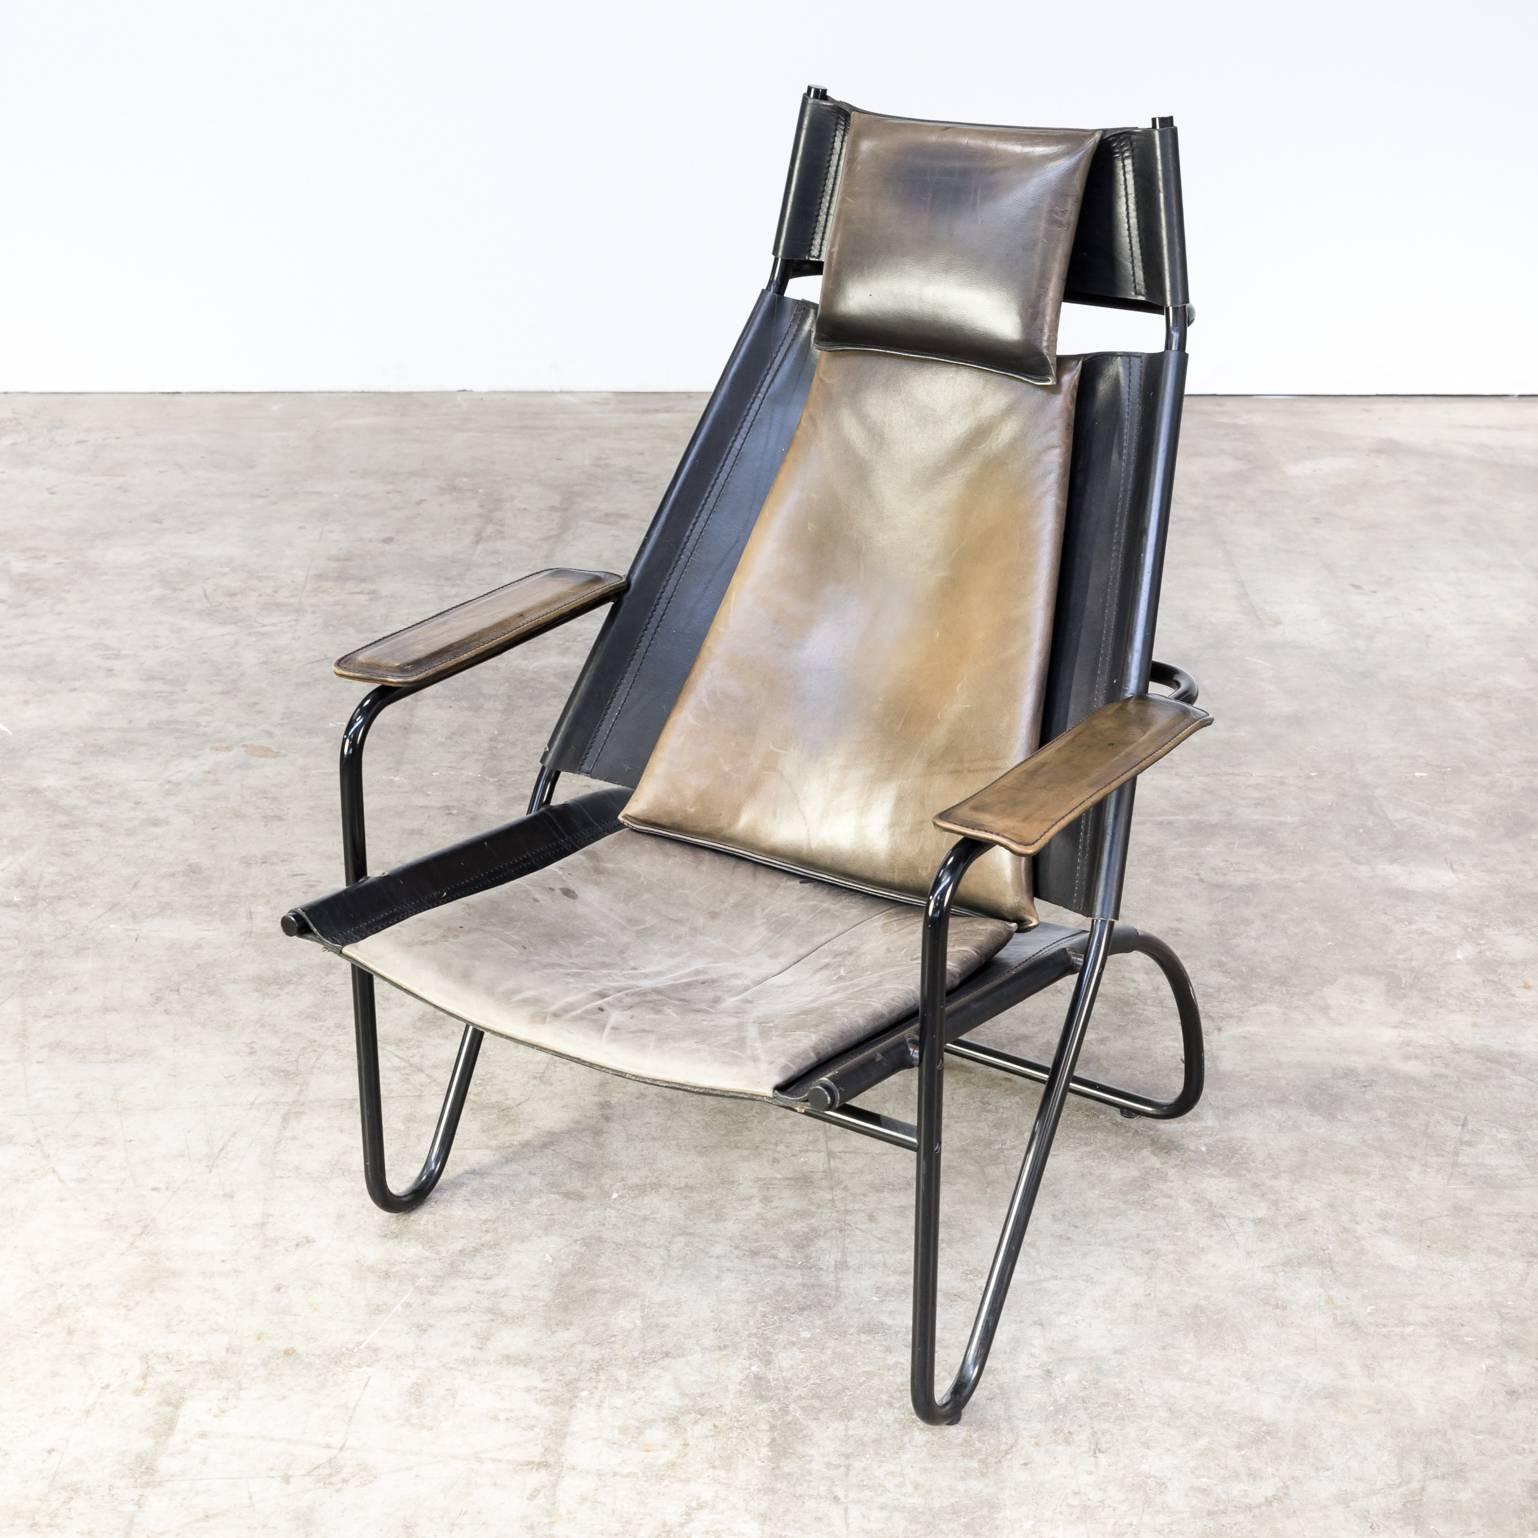 Fauteuil Retro Design.Beautiful And Rare 1980s Design Leather Fauteuil